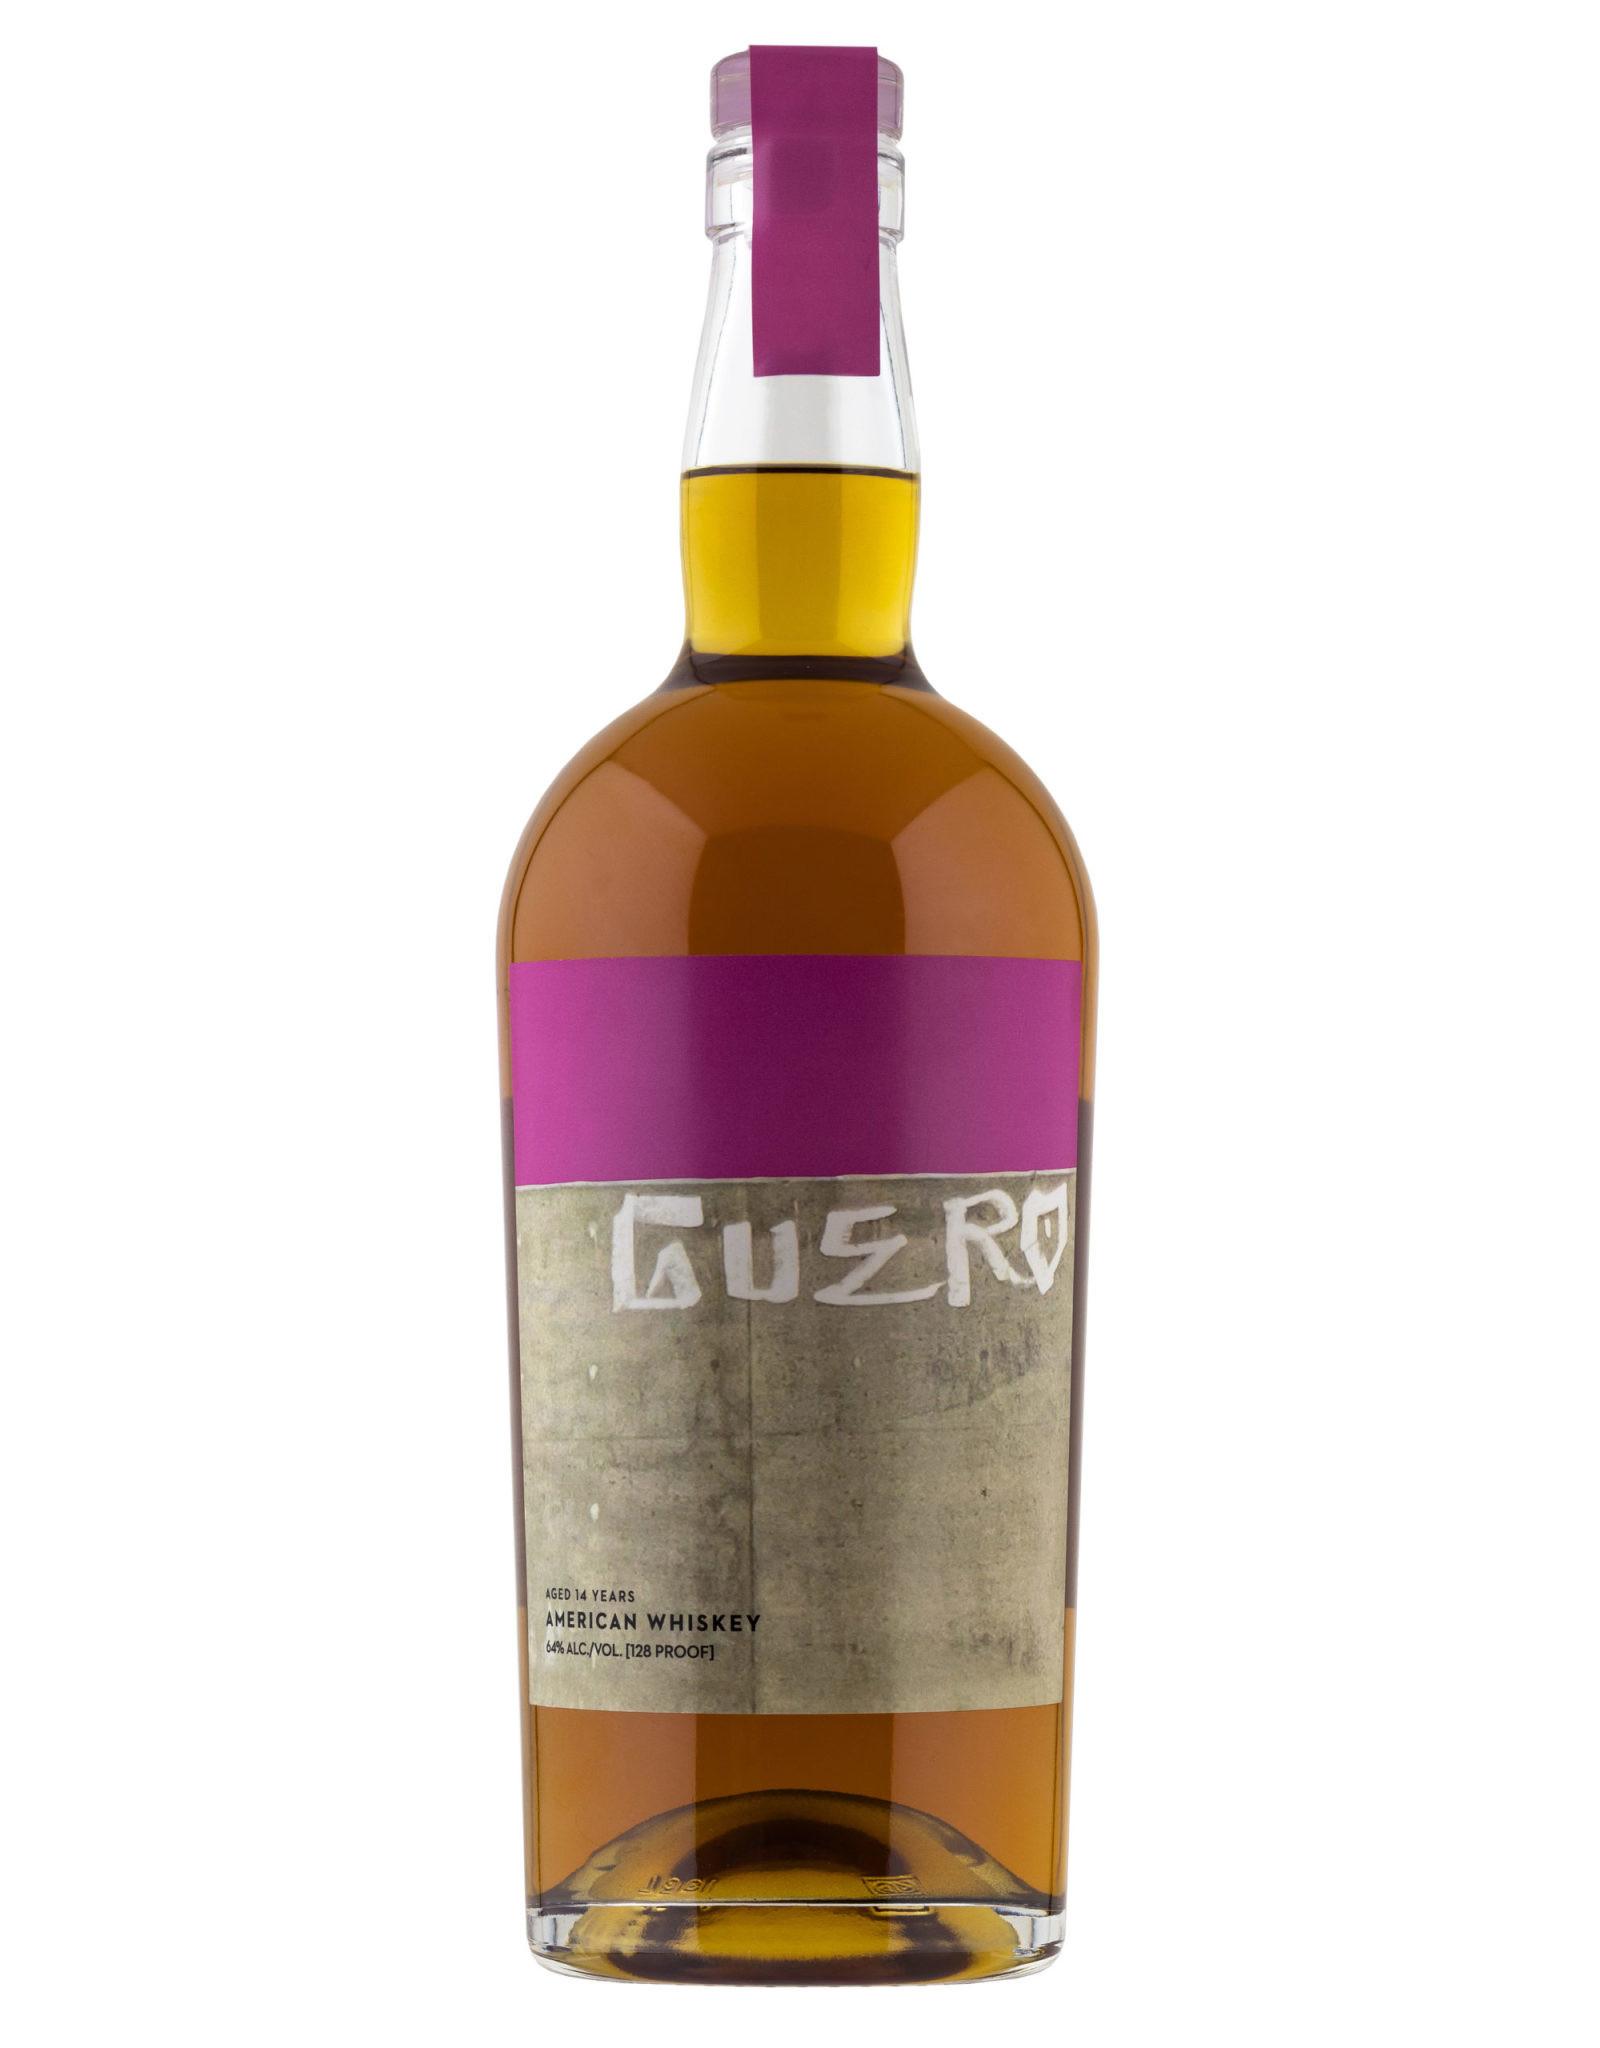 Savage & Cooke Guero American Whiskey 14 year